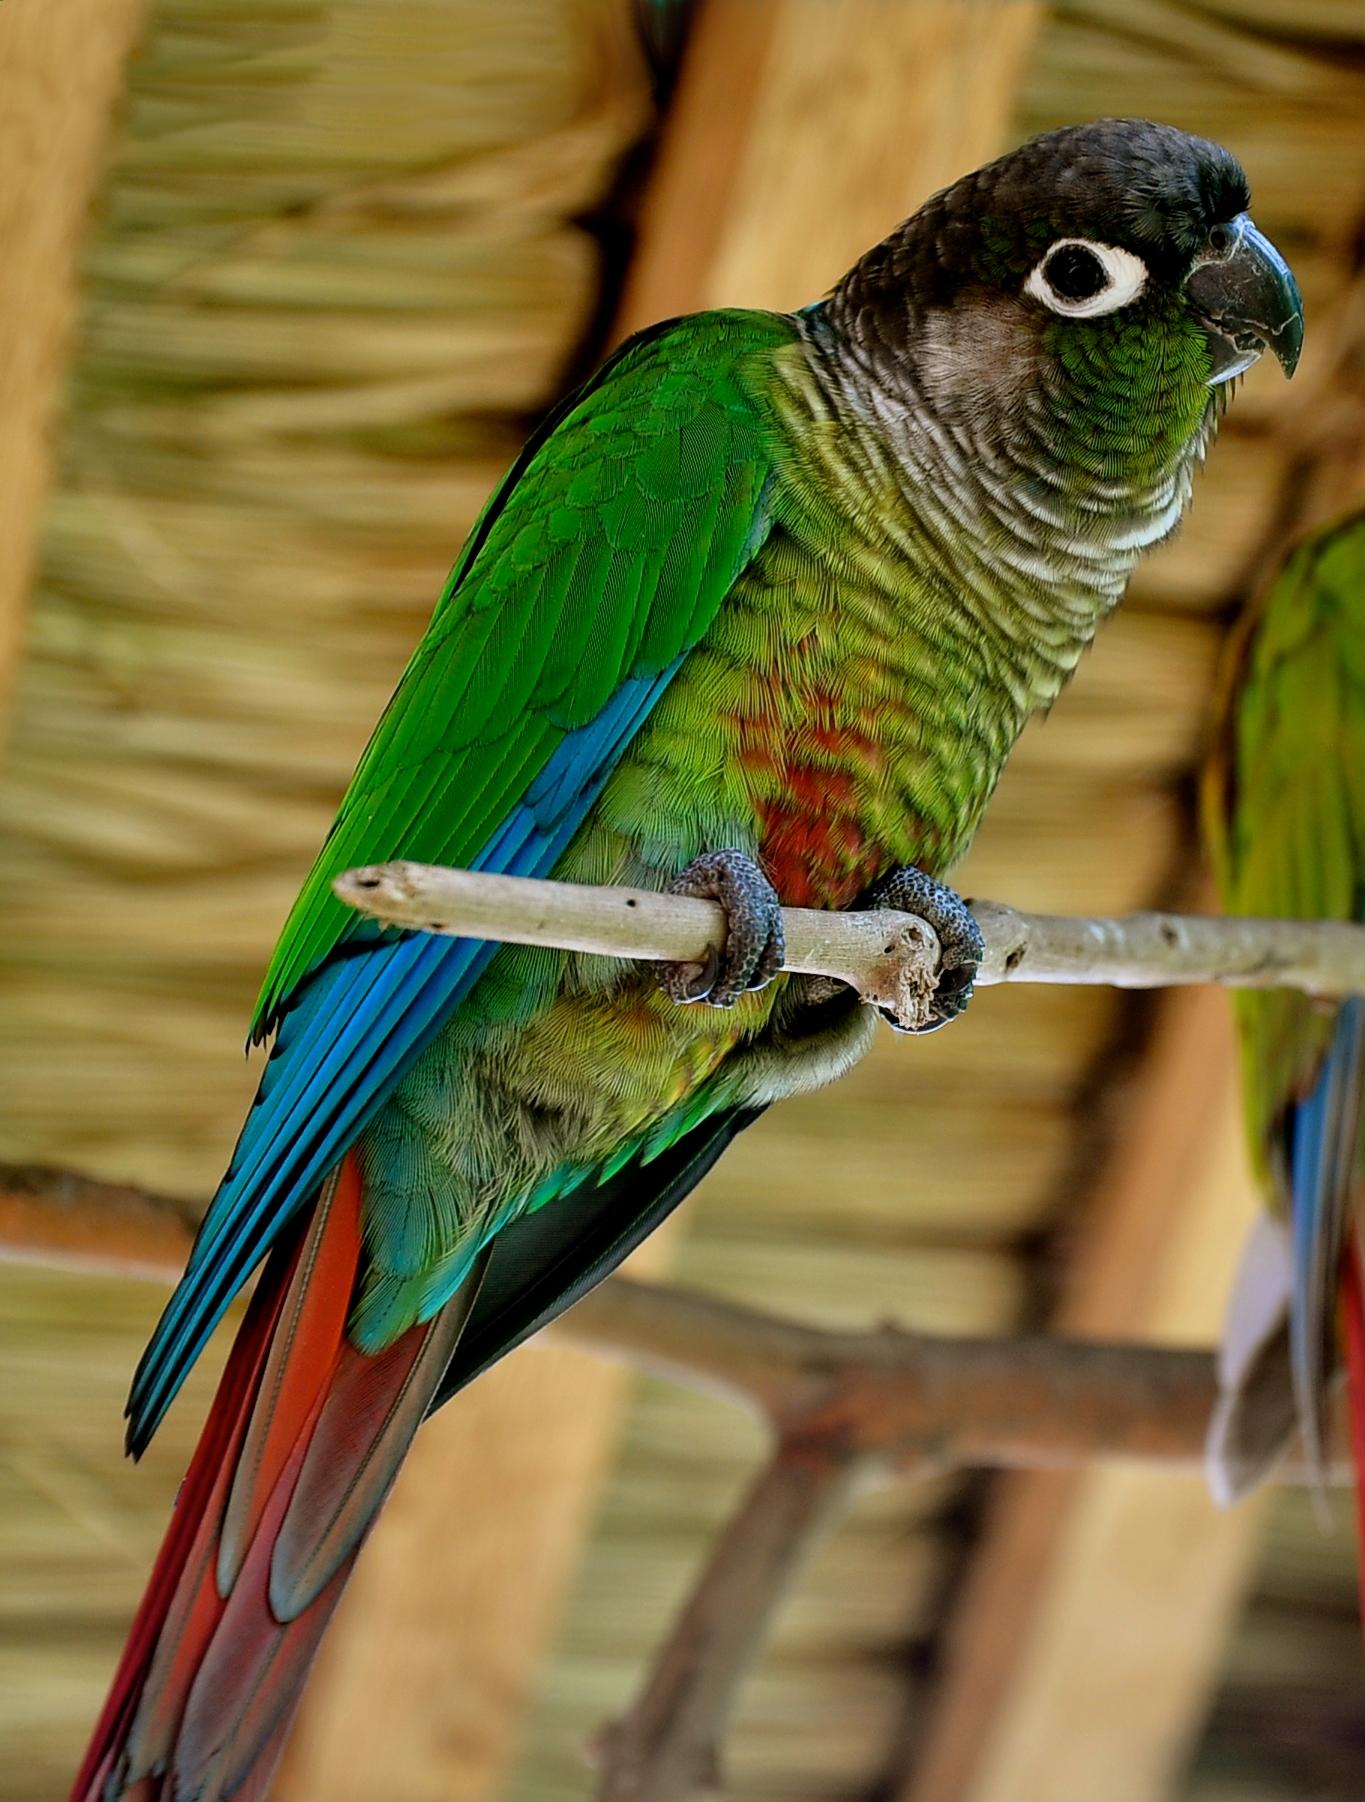 Green-cheeked parakeet - Wikipedia